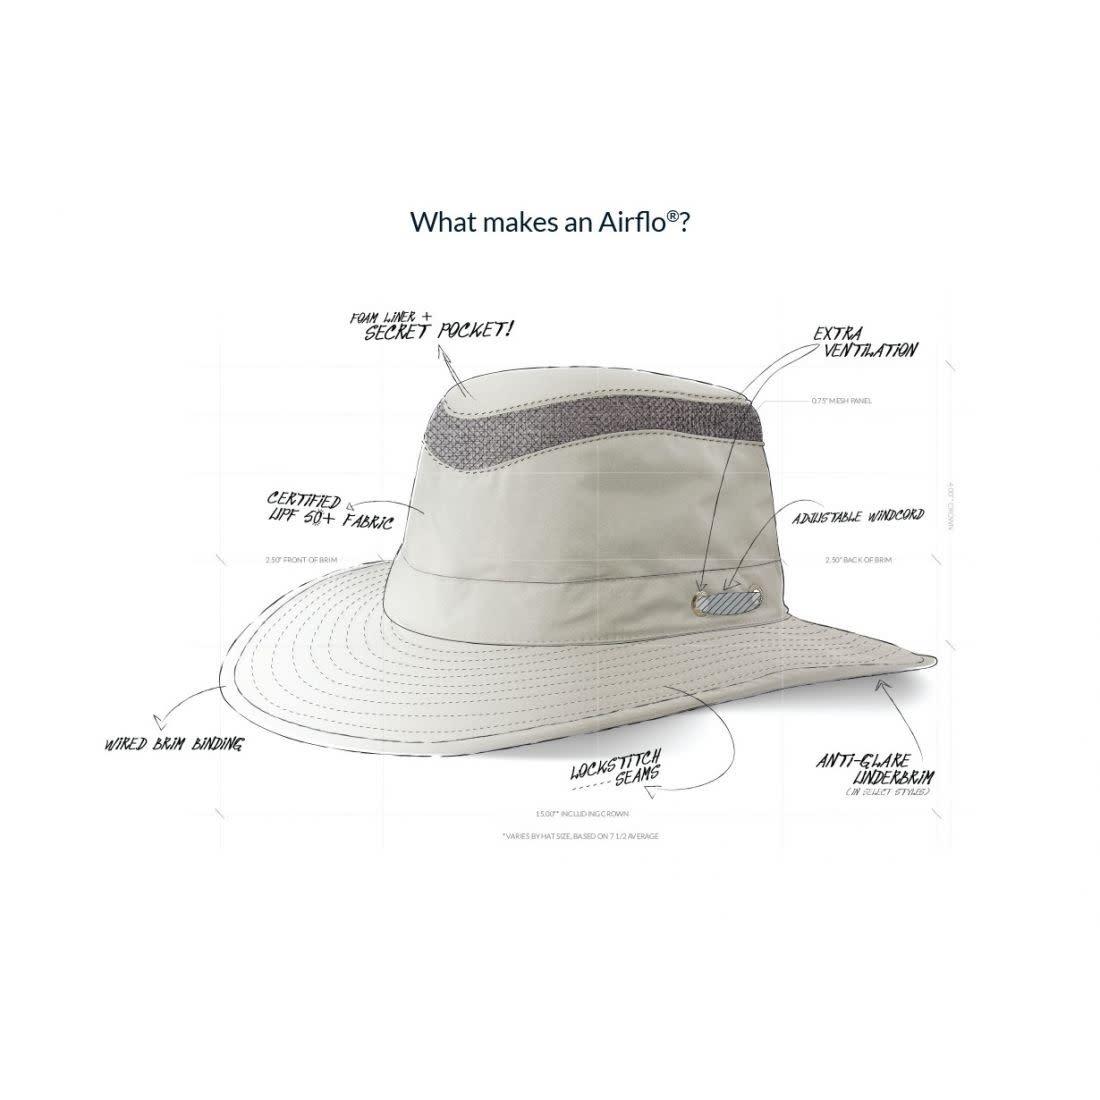 LTM5 TILLEY HAT